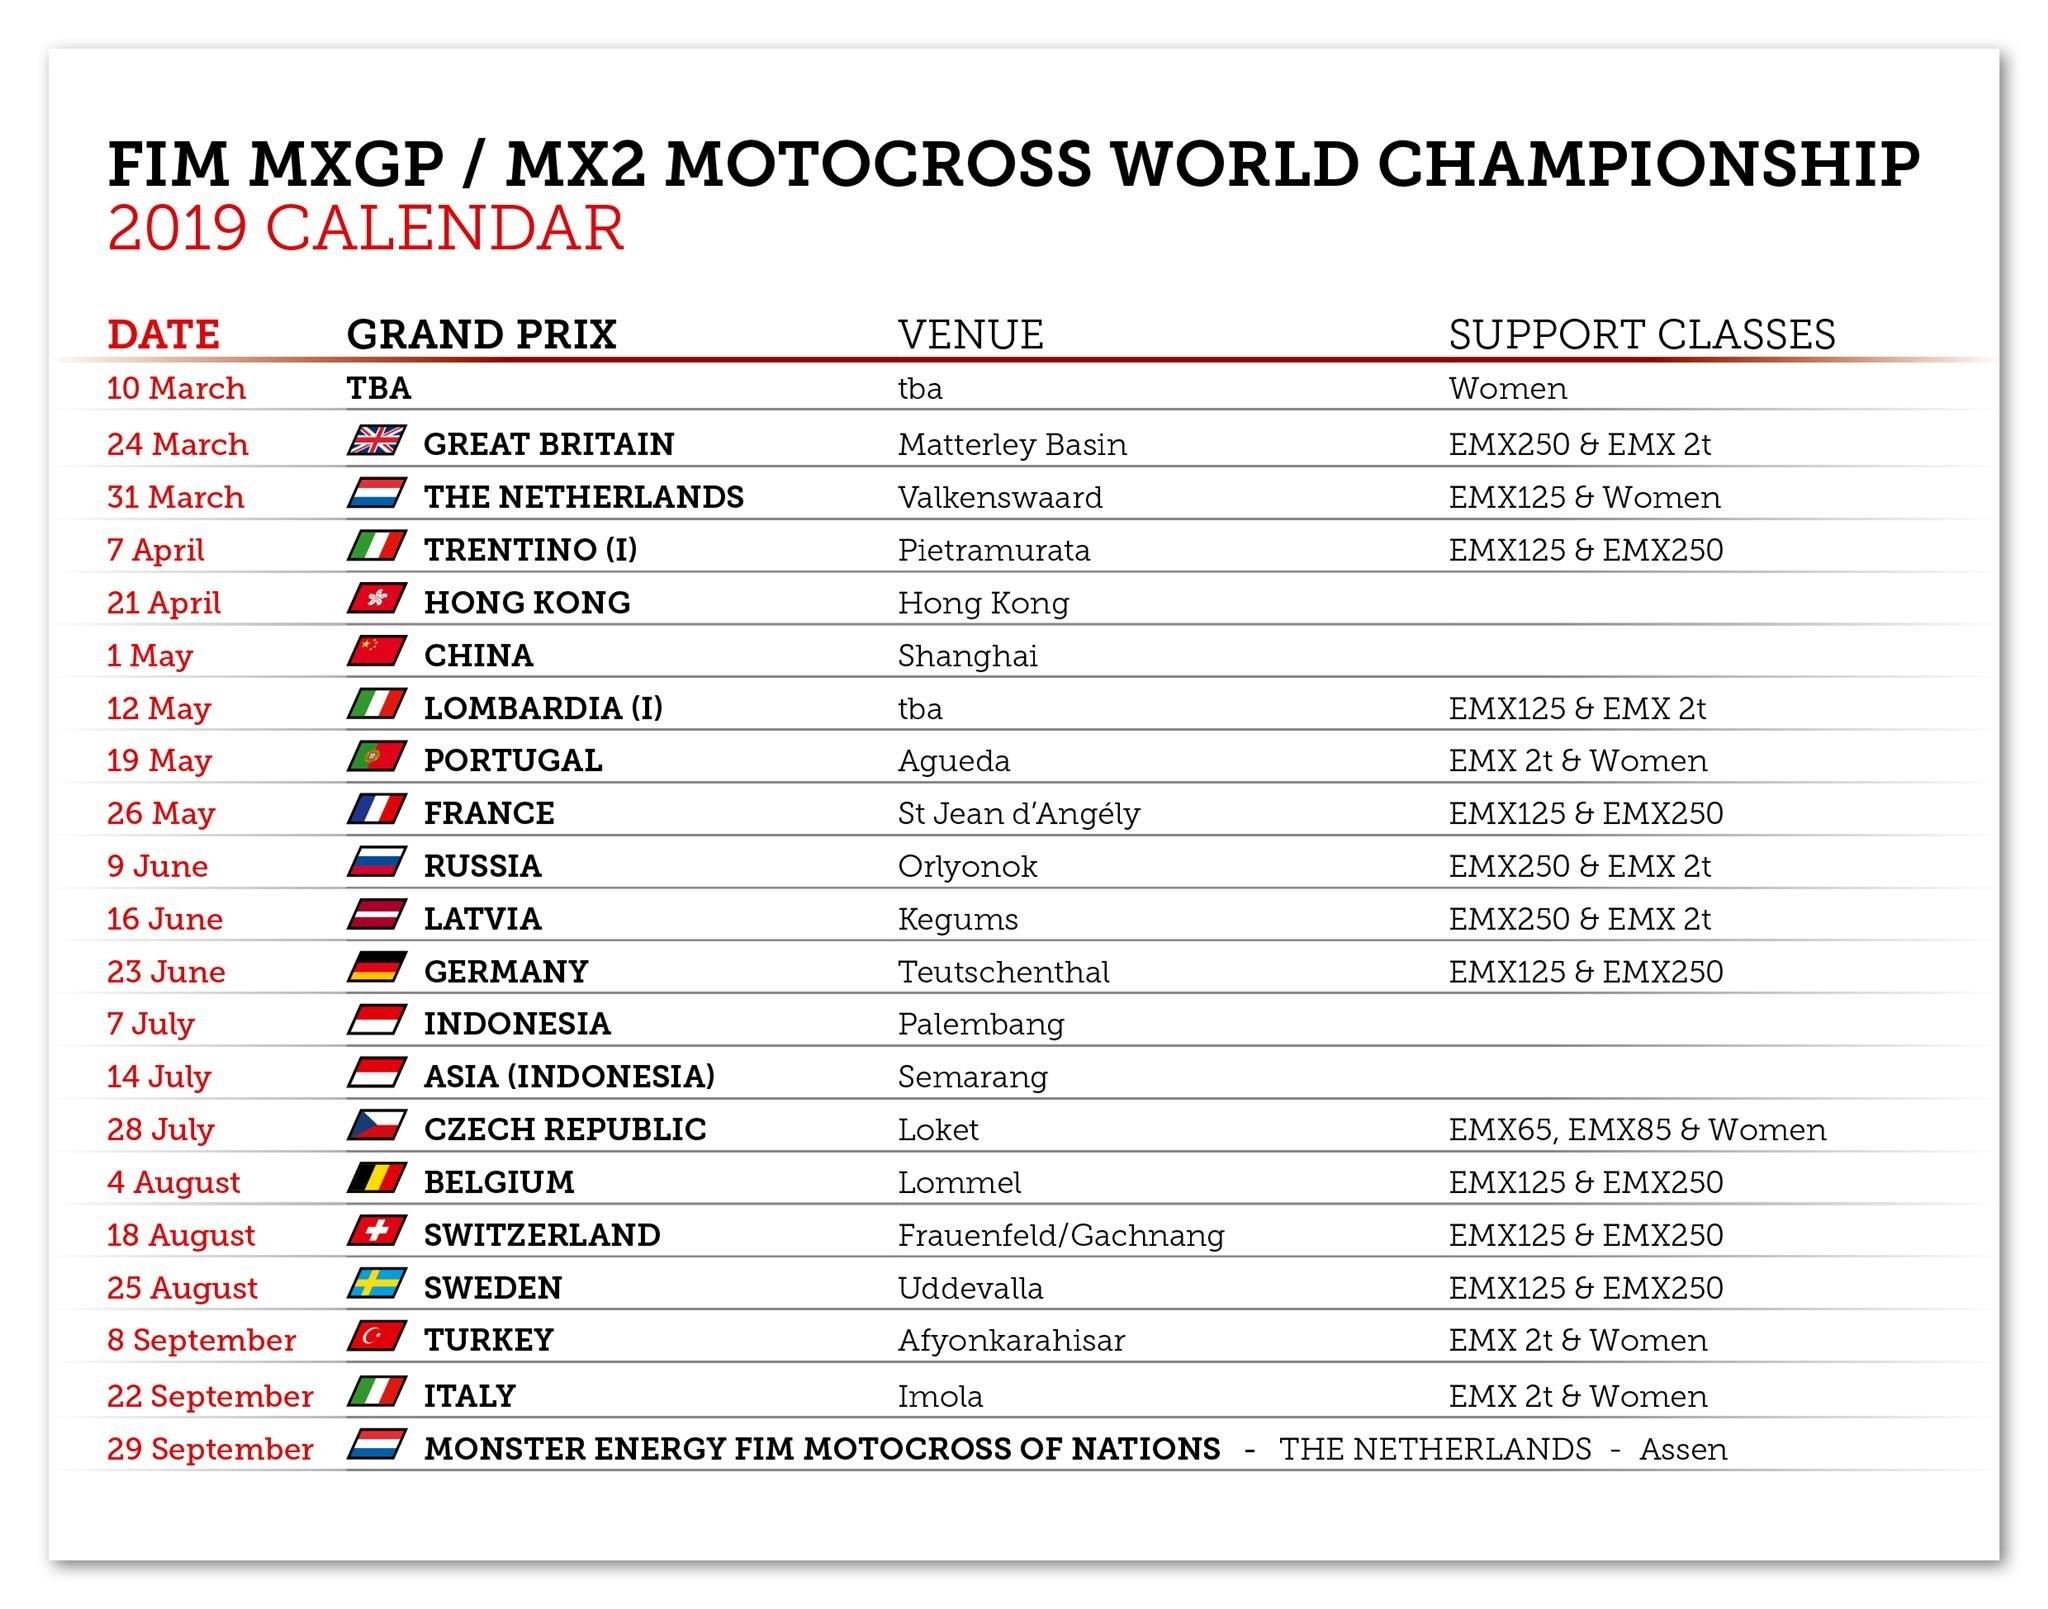 2019 Mxgp Fim Motocross World Championship Calendar | Mxgp Calendar 1/2019